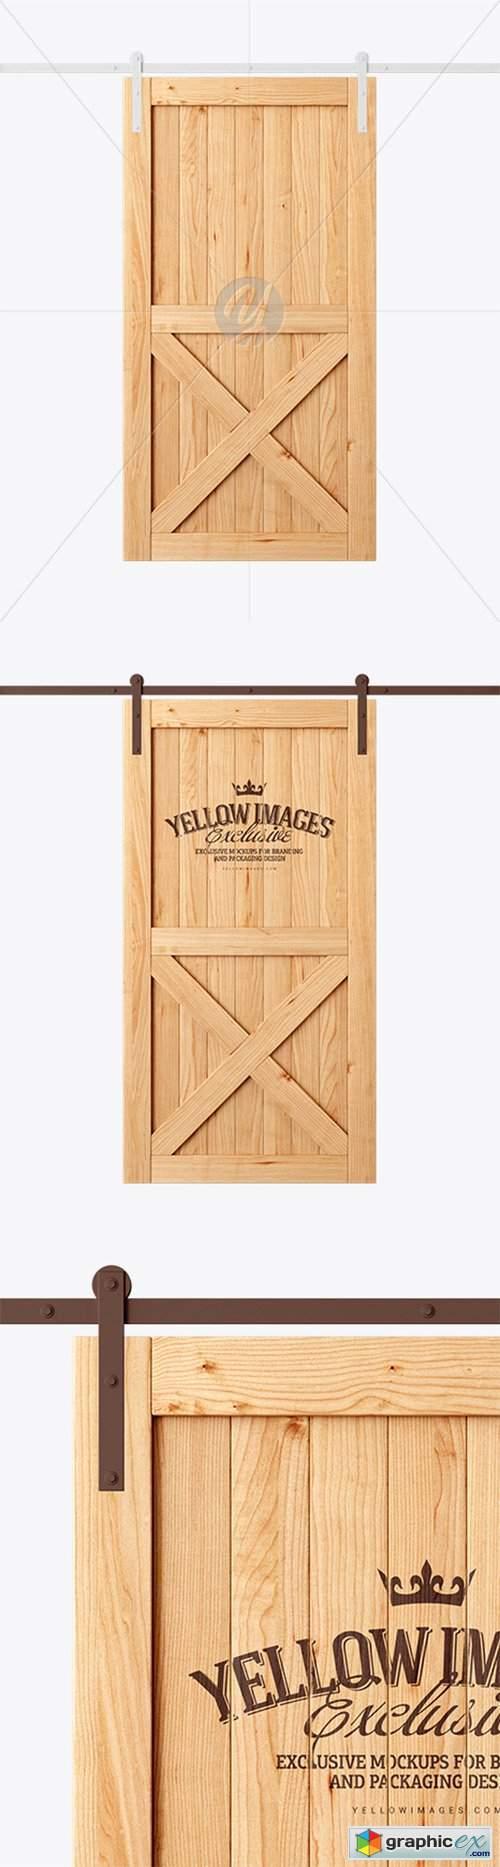 Vintage Wooden Barn Door Mockup